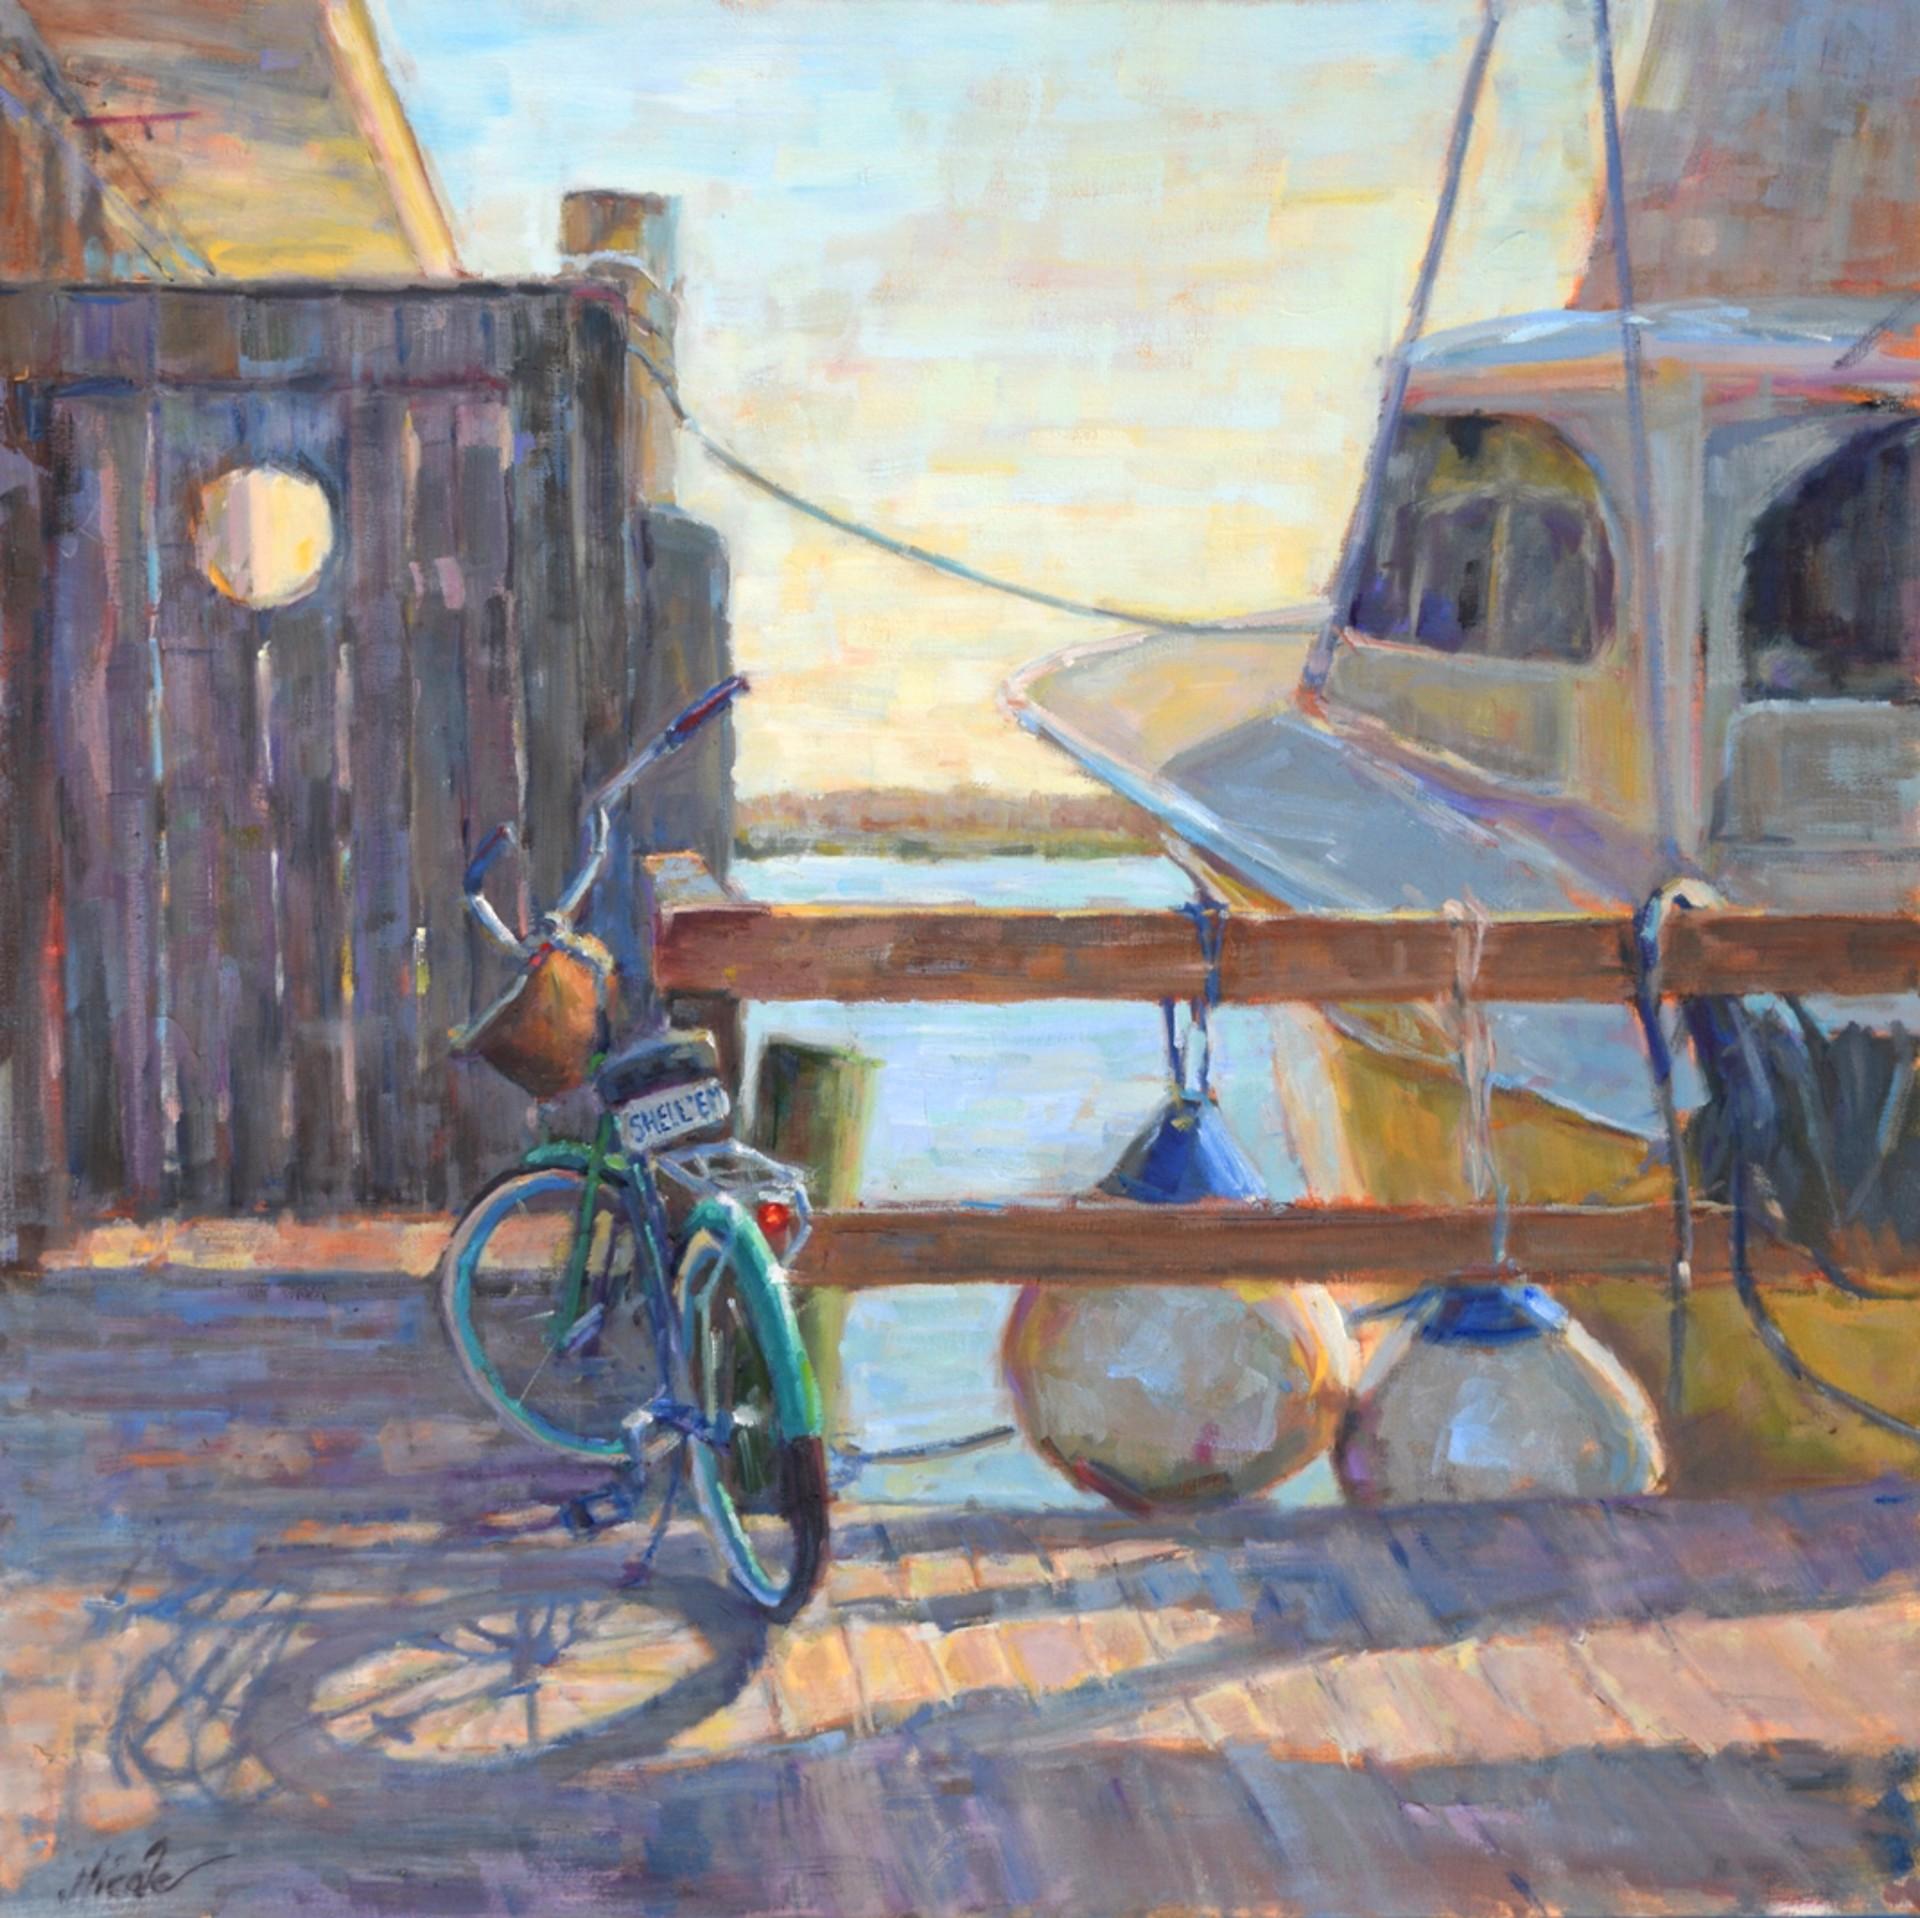 Coastal Modes of Transportation by Nicole White Kennedy